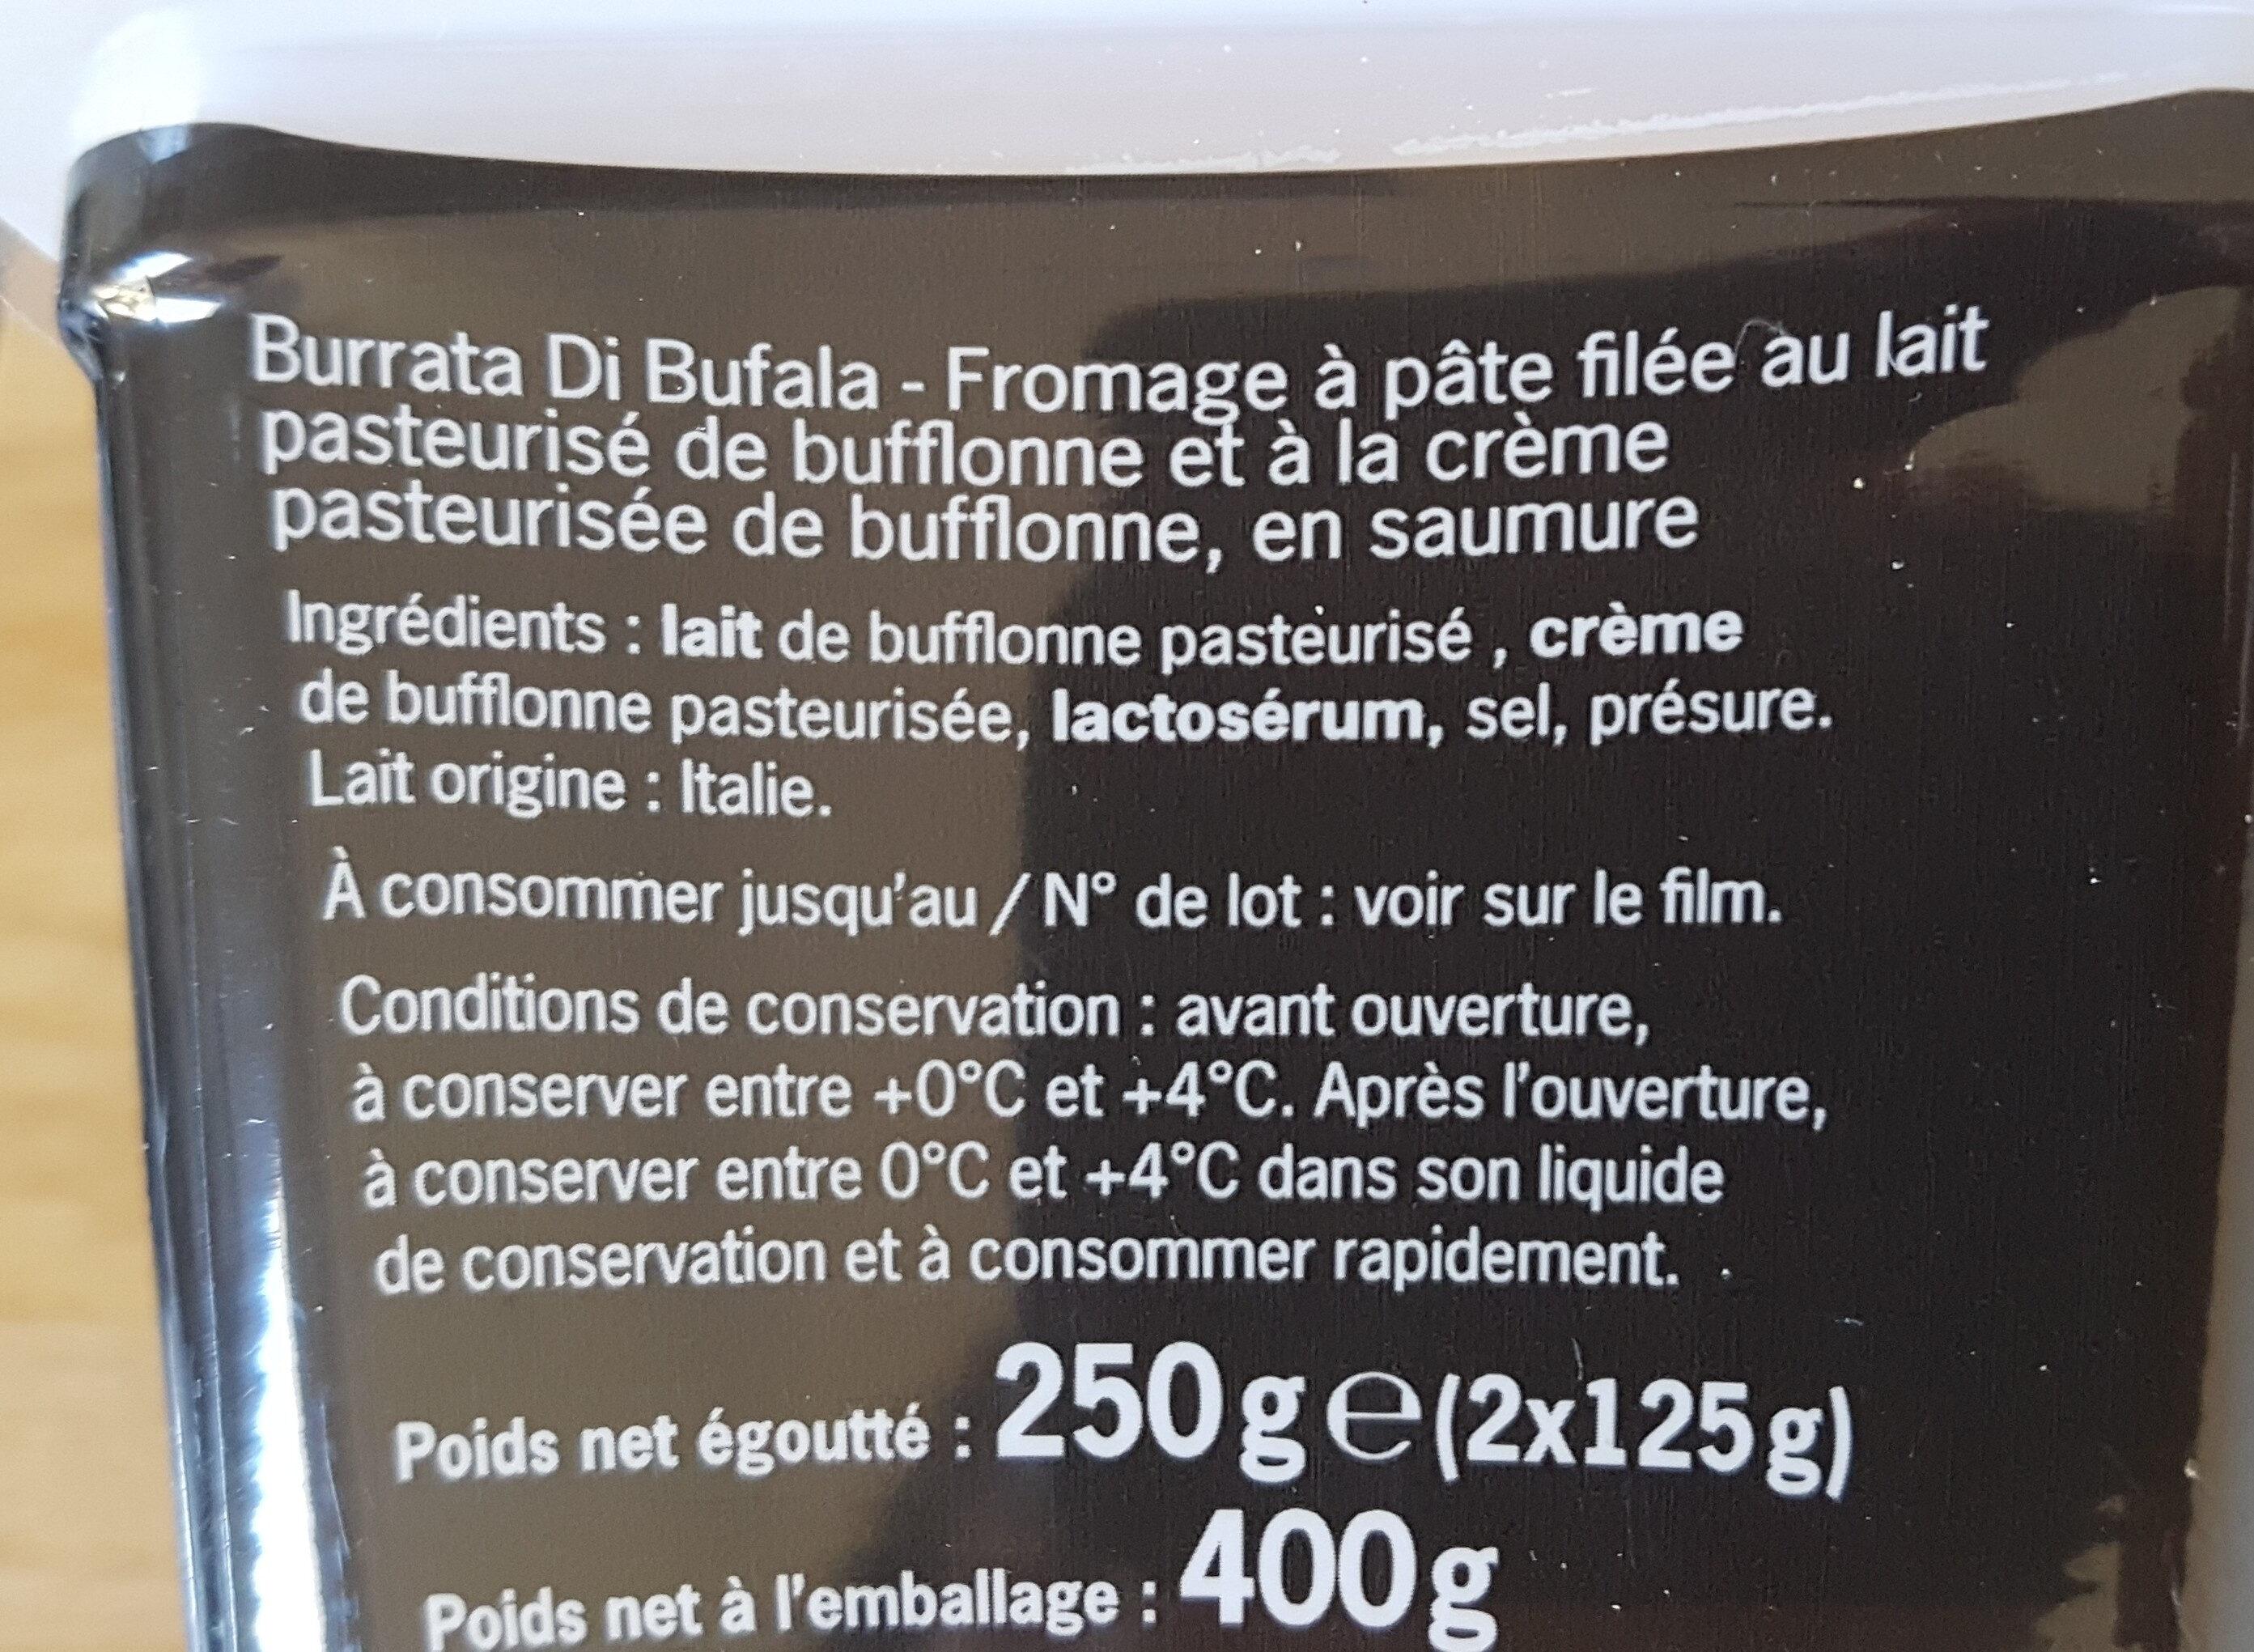 Burrata Di Bufala - Ingredients